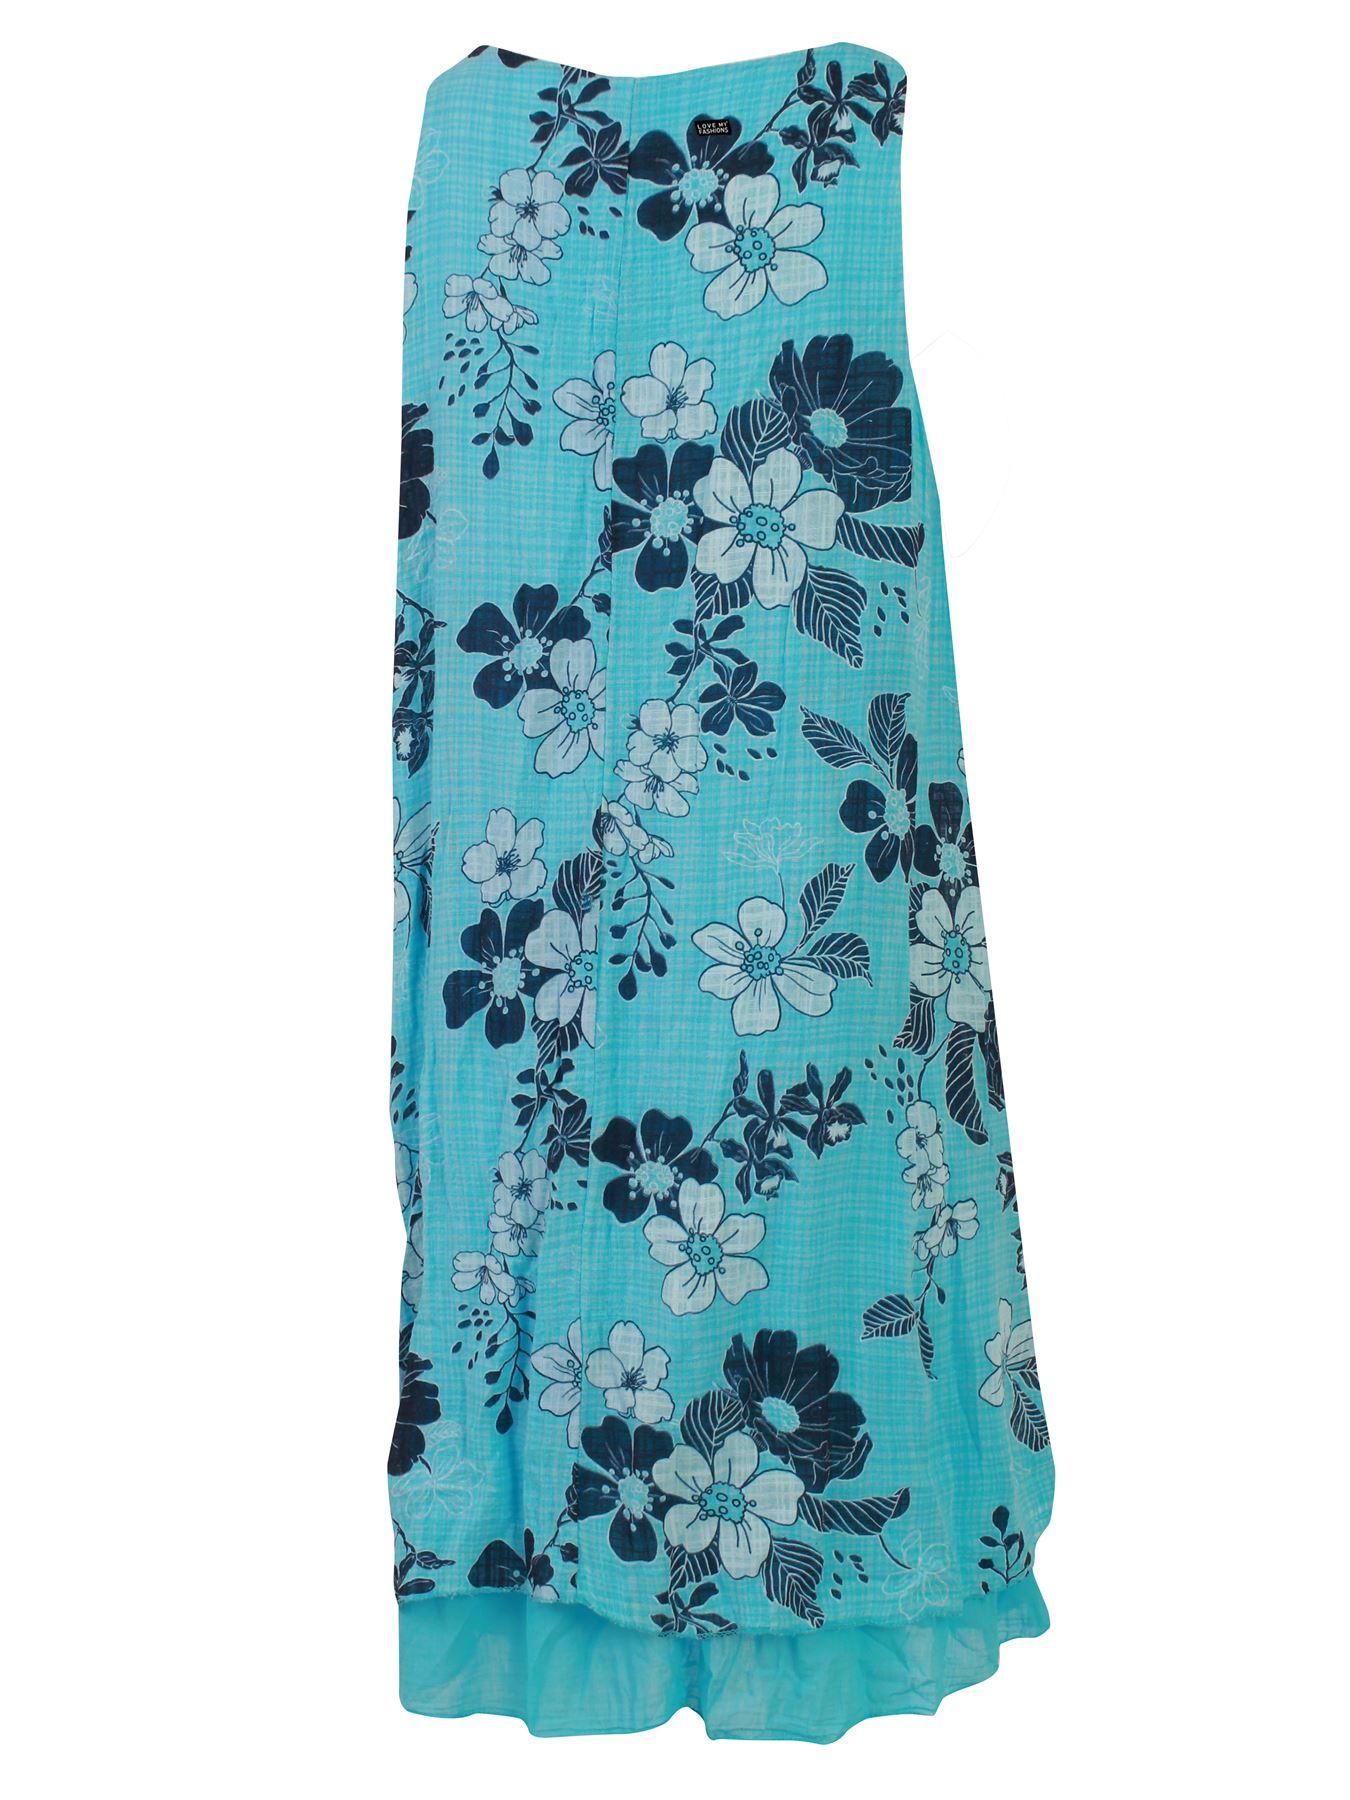 Womens-Floral-Print-Italian-Fashion-Lagenlook-Summer-Cotton-Crew-Neck-Dress thumbnail 27